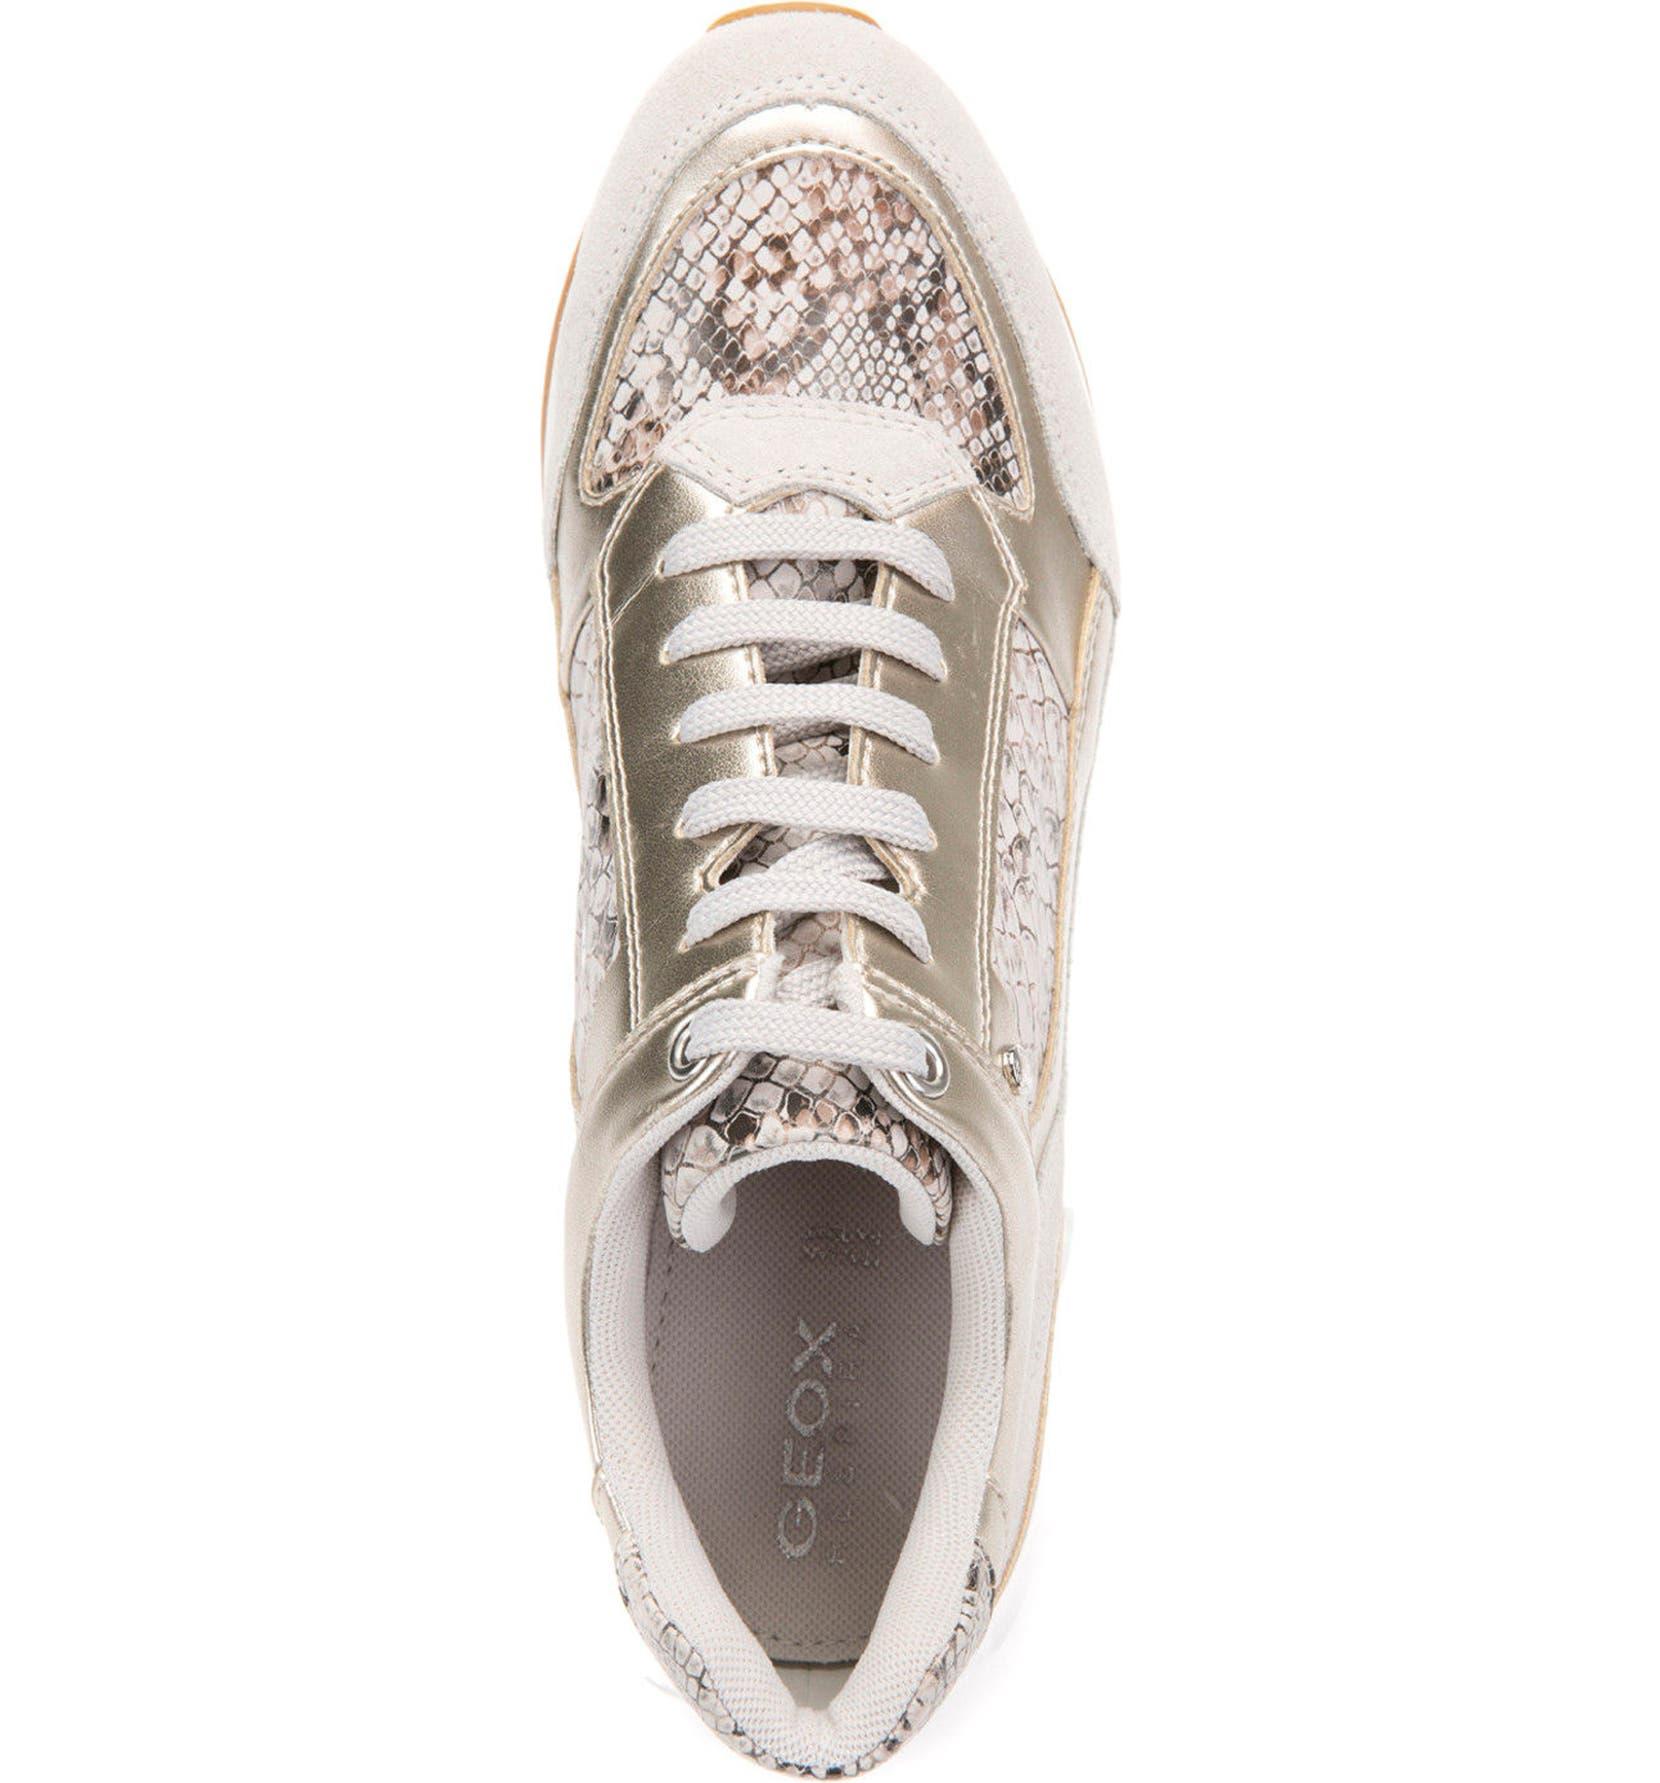 cfa0ca776fd Geox Nydame Embellished Wedge Sneaker (Women) | Nordstrom